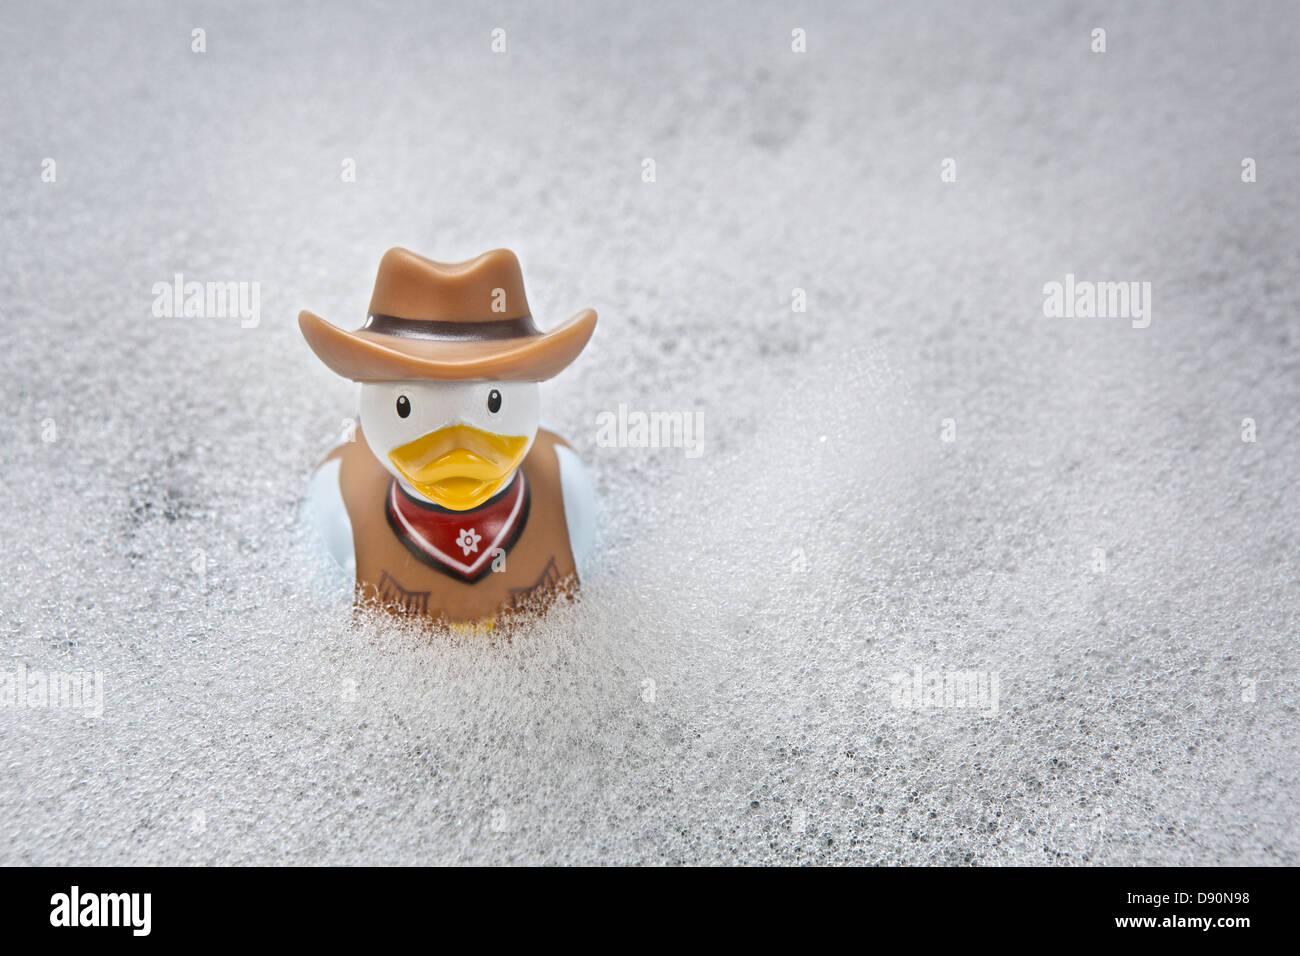 Sheriff Rubber Duck - Schaumbad Zeit Thema Stockbild